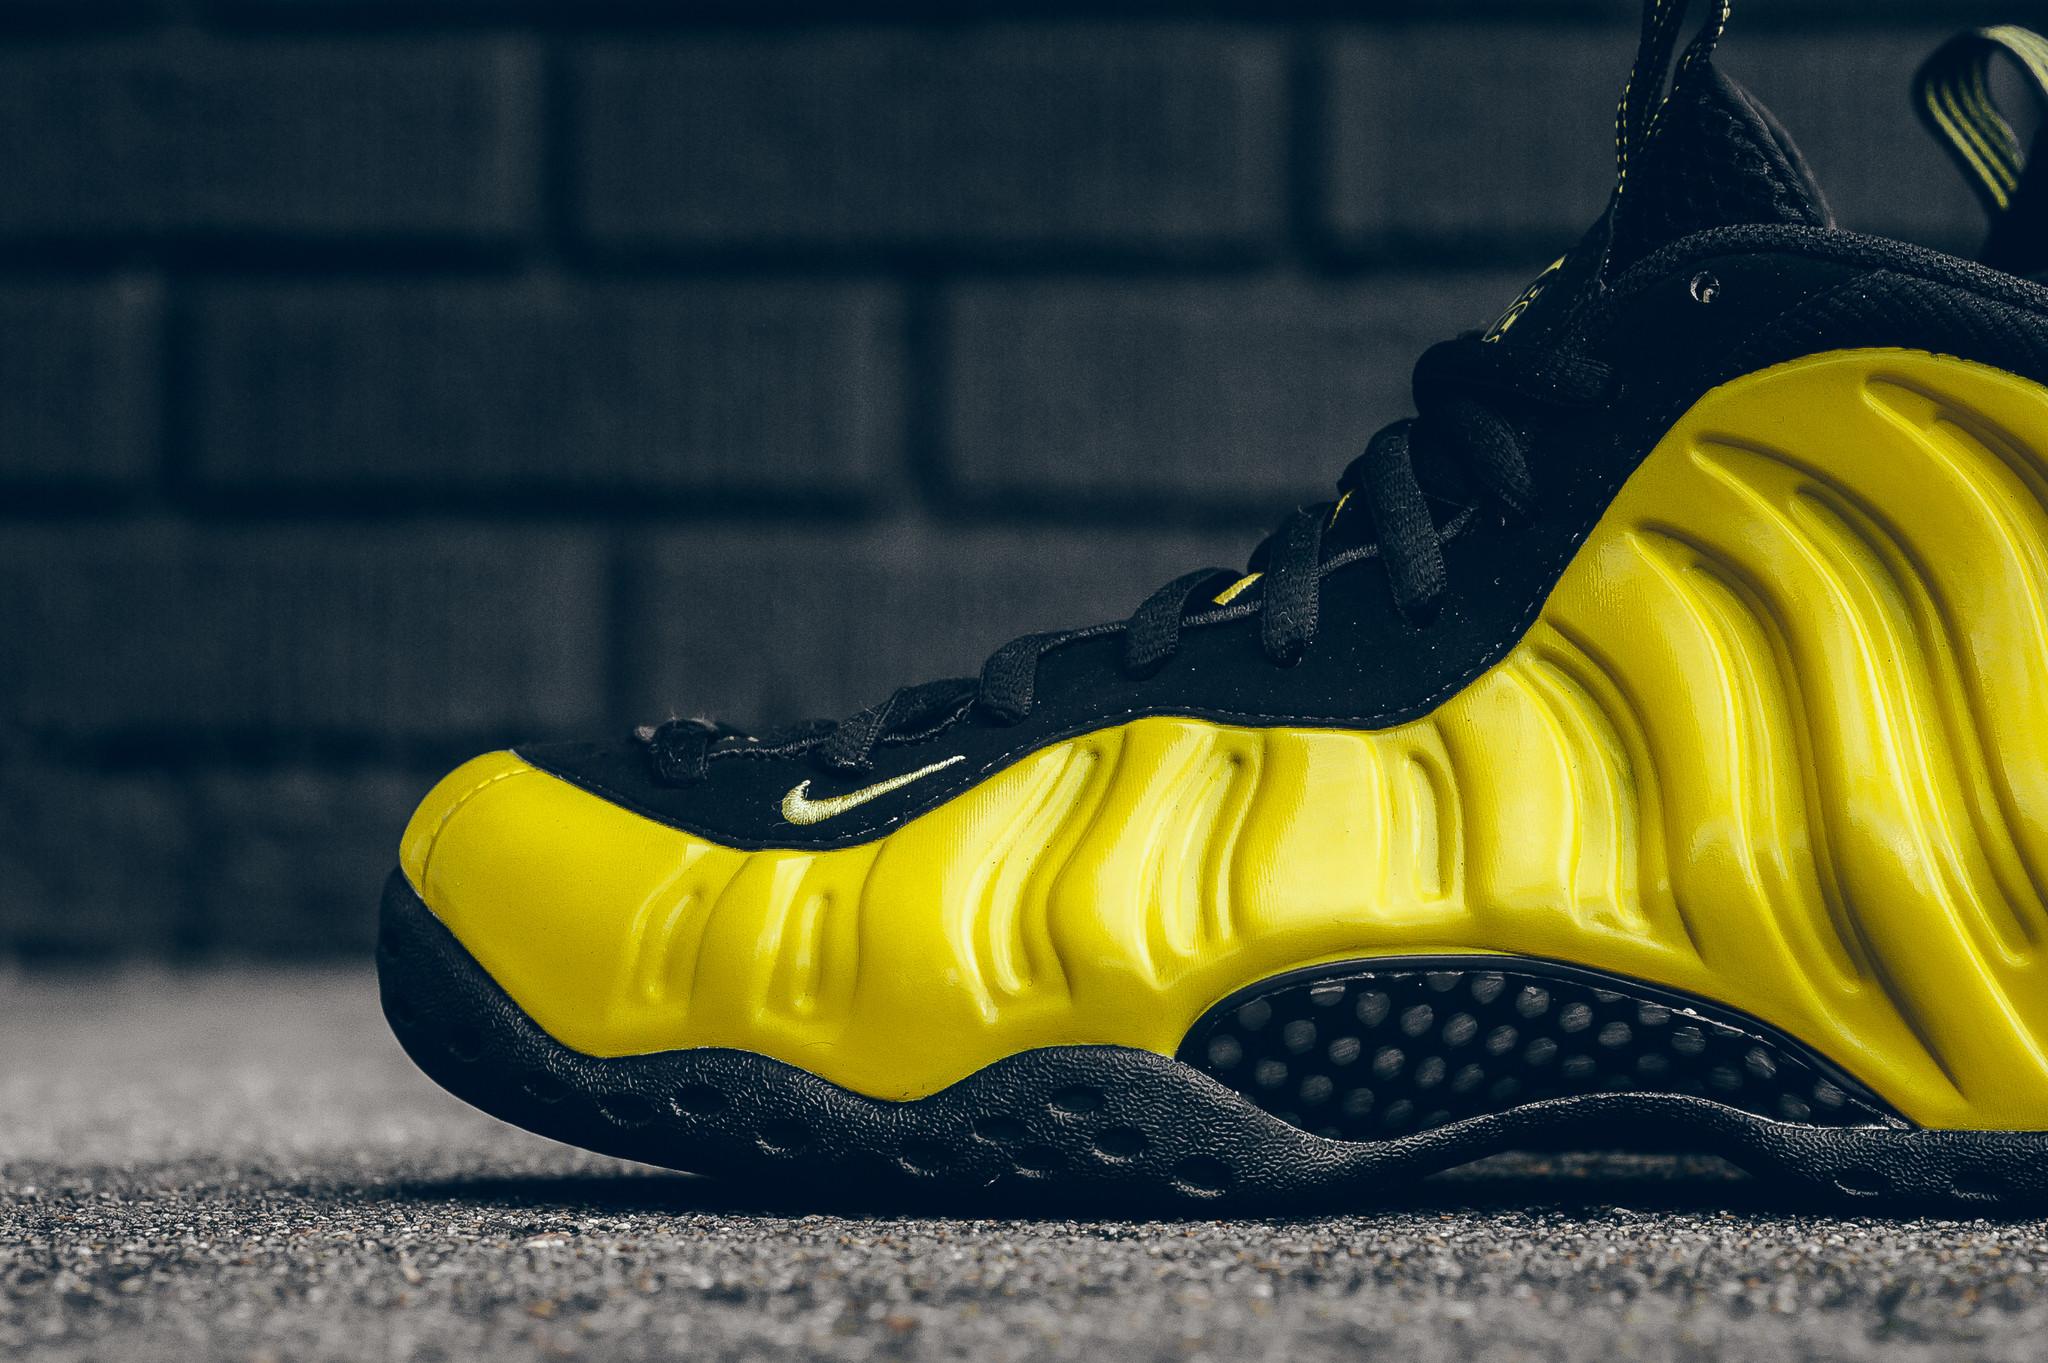 chaussure Nike Air Foamposite 'Wu Tang' (3)